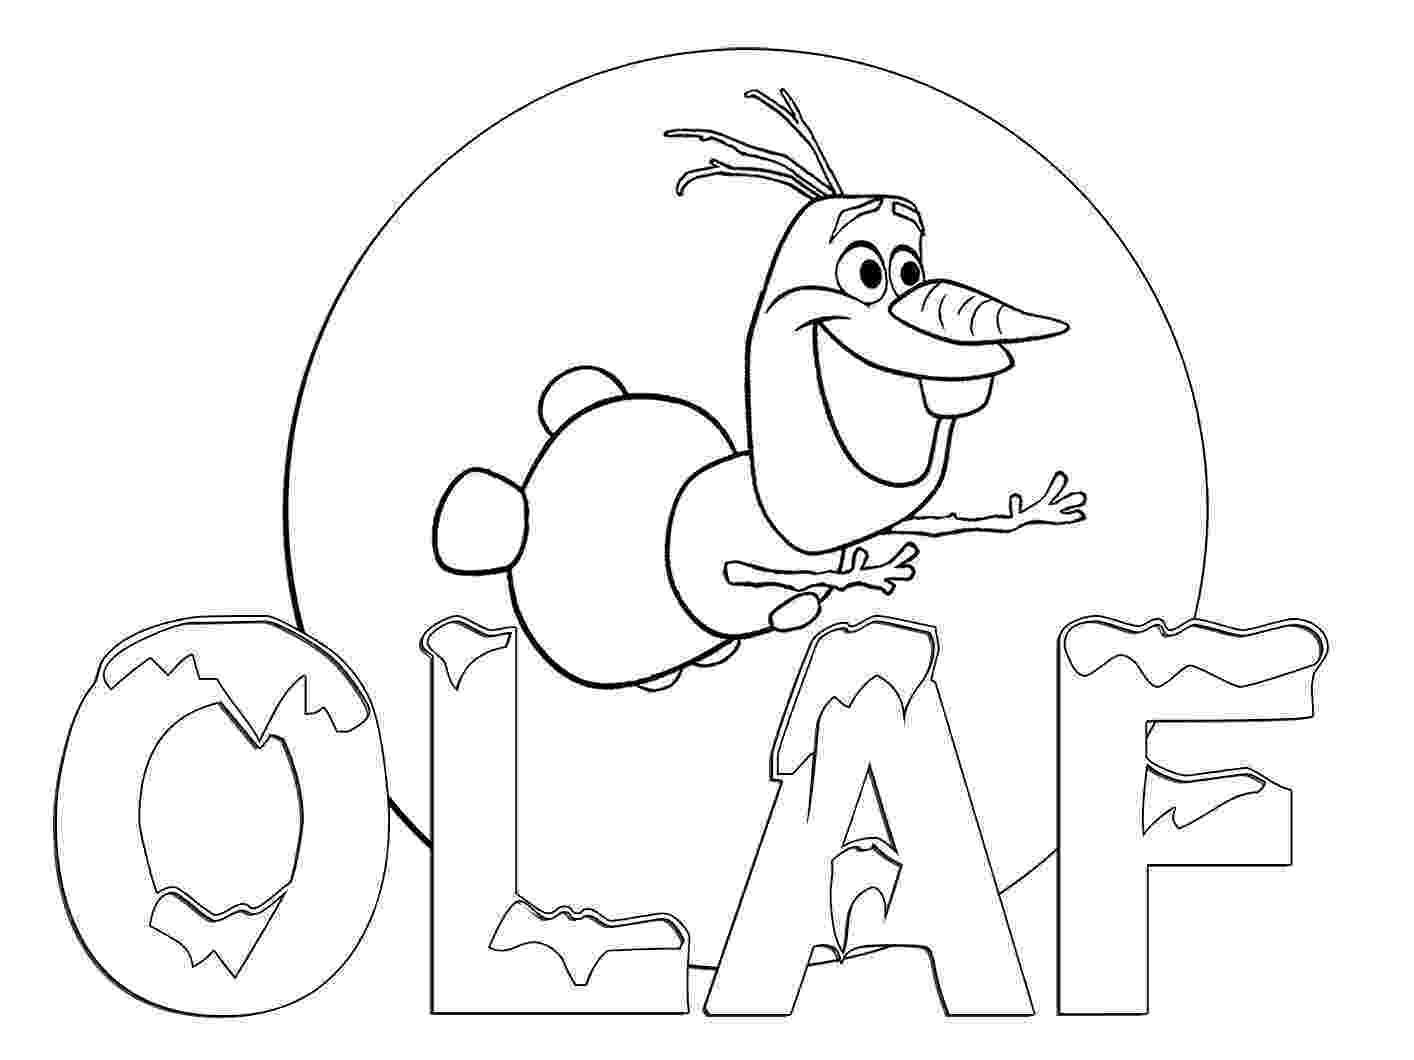 frozen olaf coloring disney39s frozen coloring pages 2 disneyclipscom coloring olaf frozen